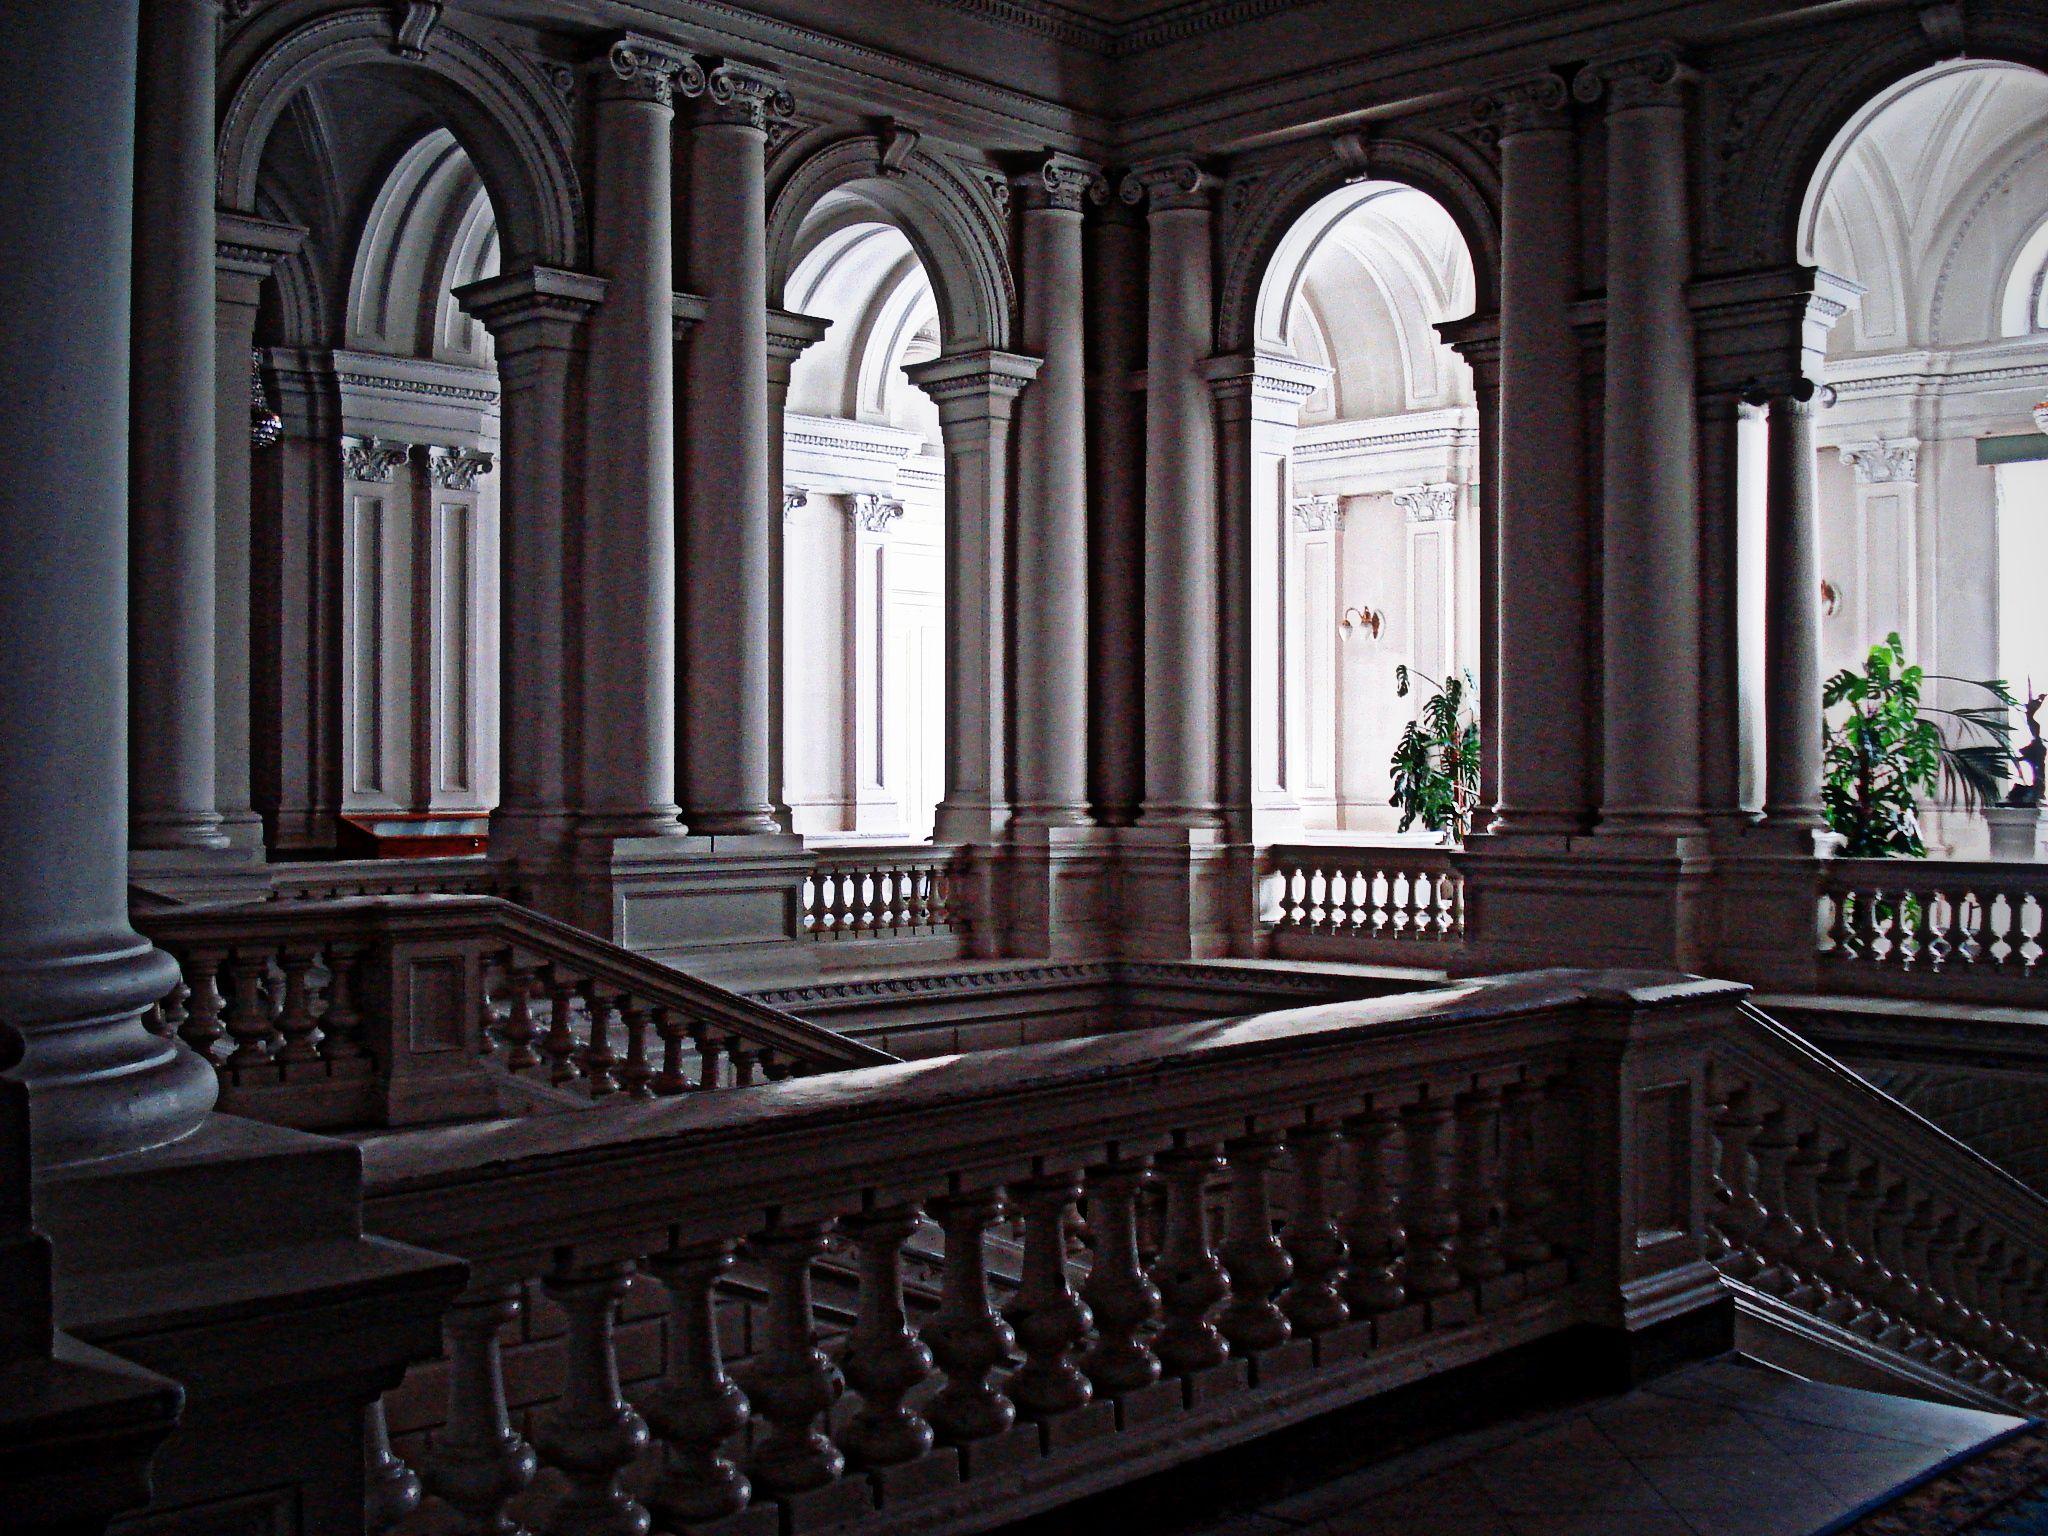 St. Petersburg Conservatory, by Miklós Balázs